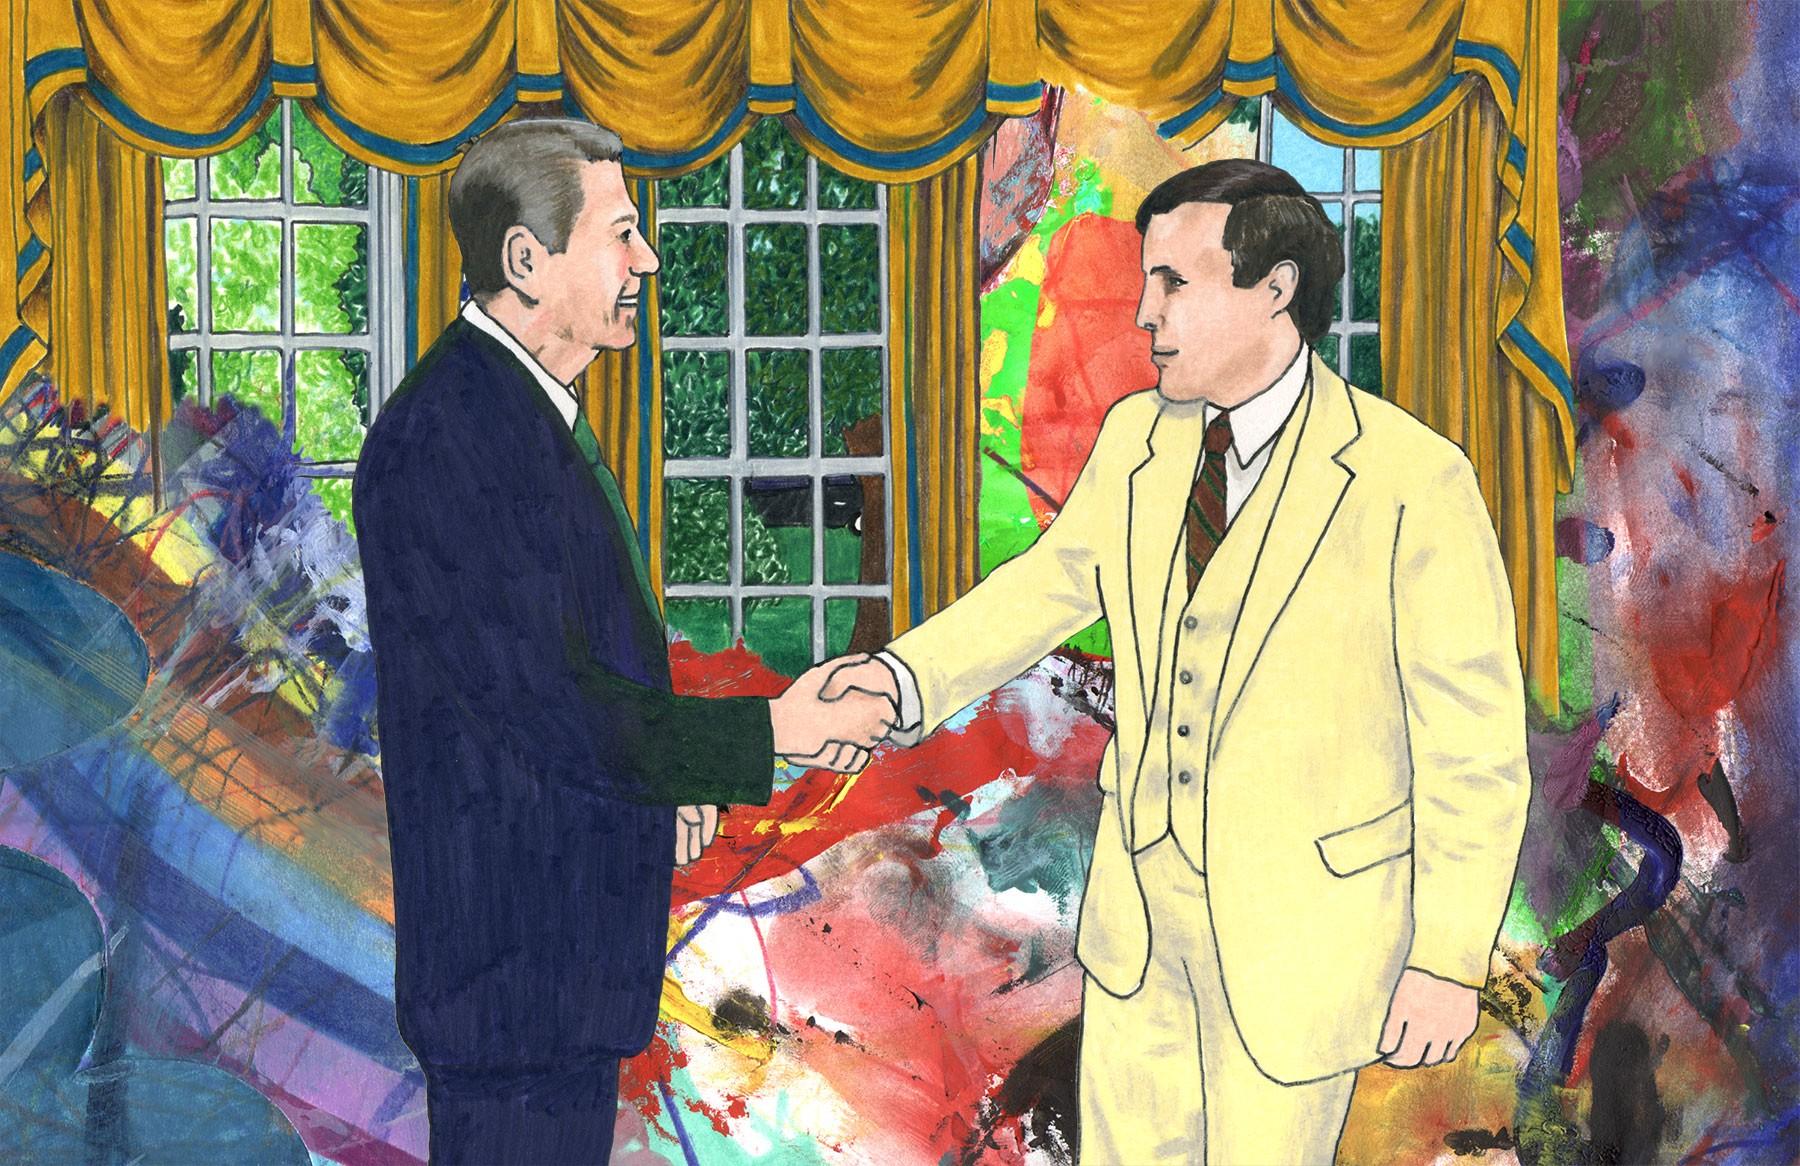 Ronald Reagan and Rudolph Giuliani